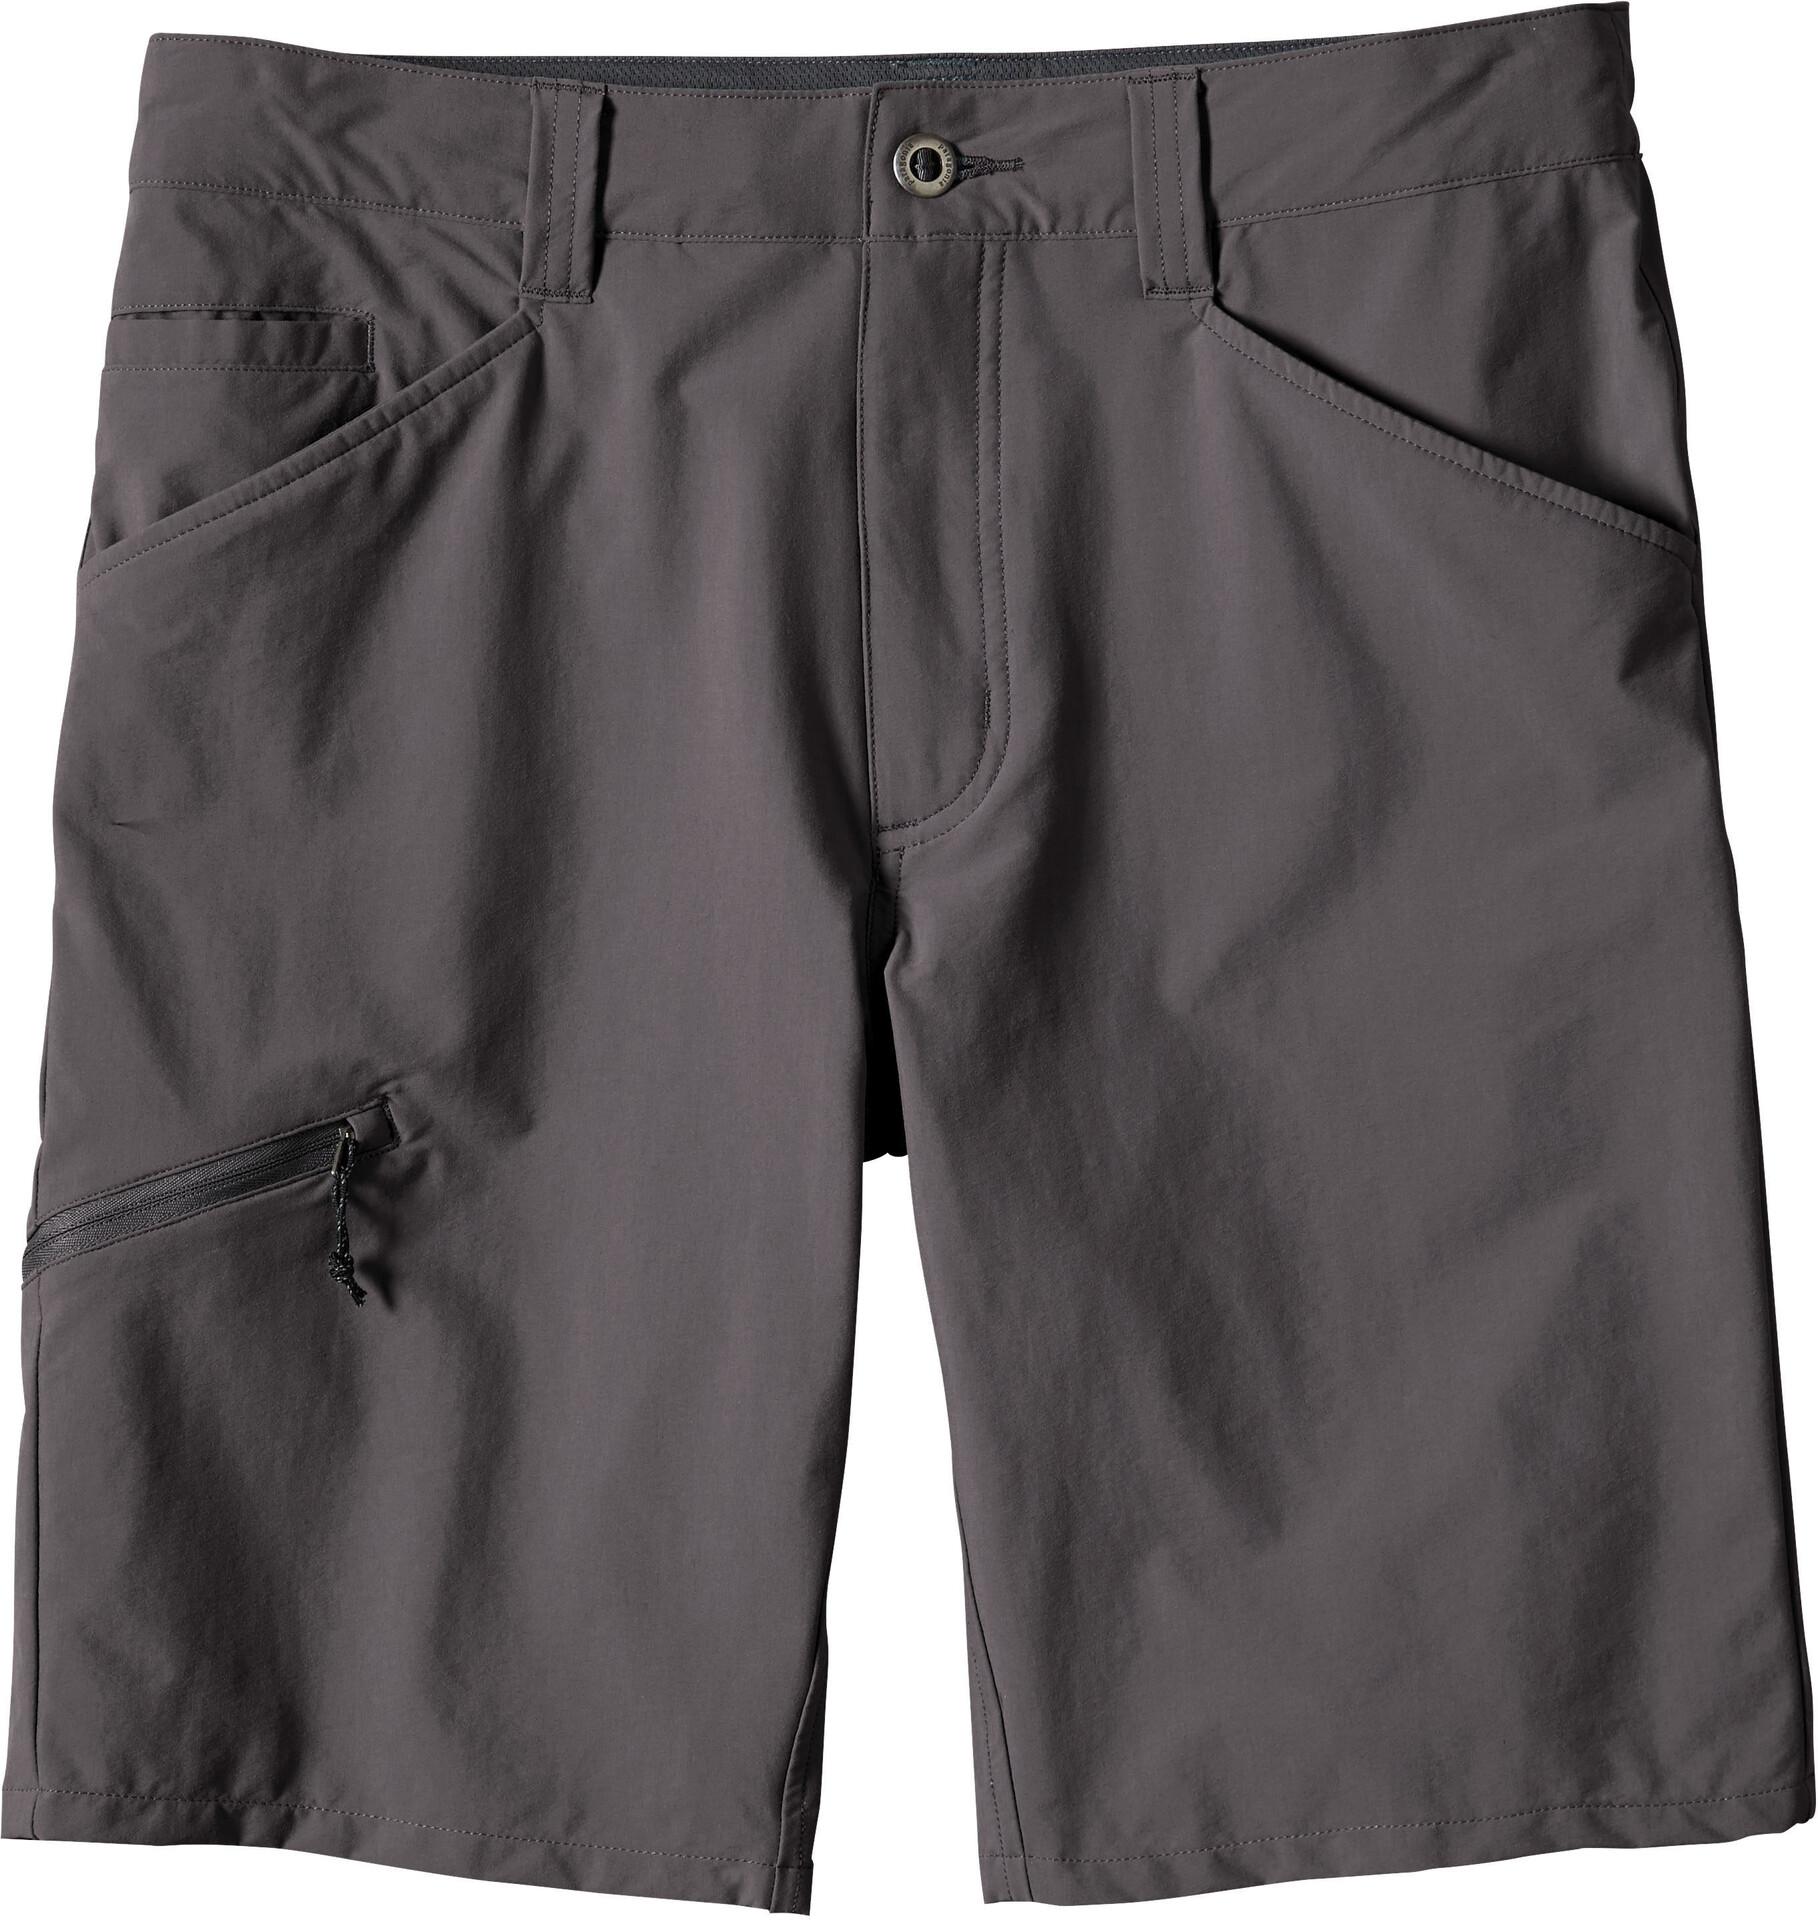 At Grey Shorts co uk 10 Men Quandary Addnature Patagonia wXgIqH6